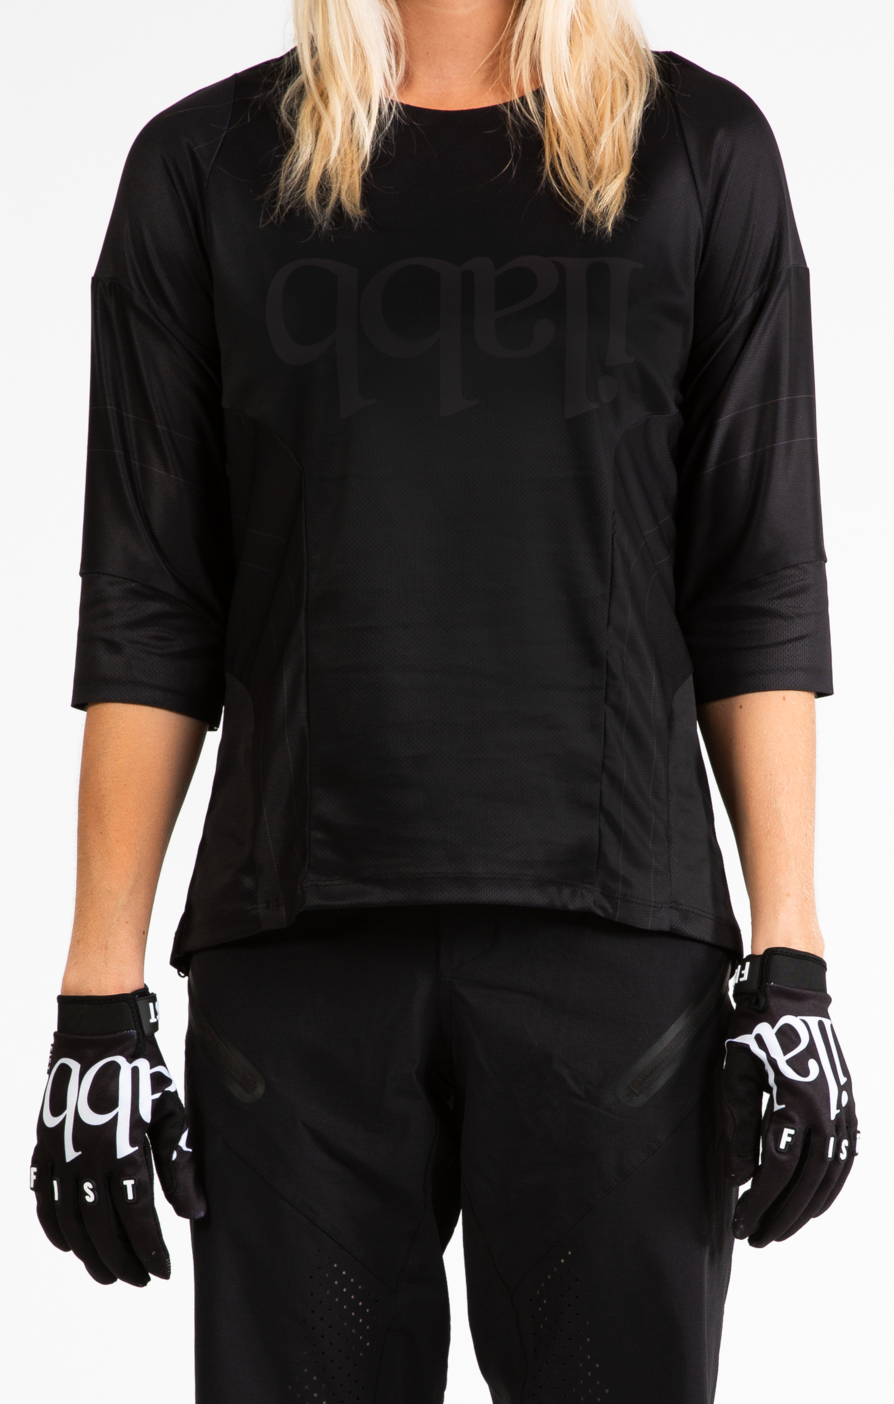 Don Race 3/4 Shirt Womens - Black/Black ライドシャツ